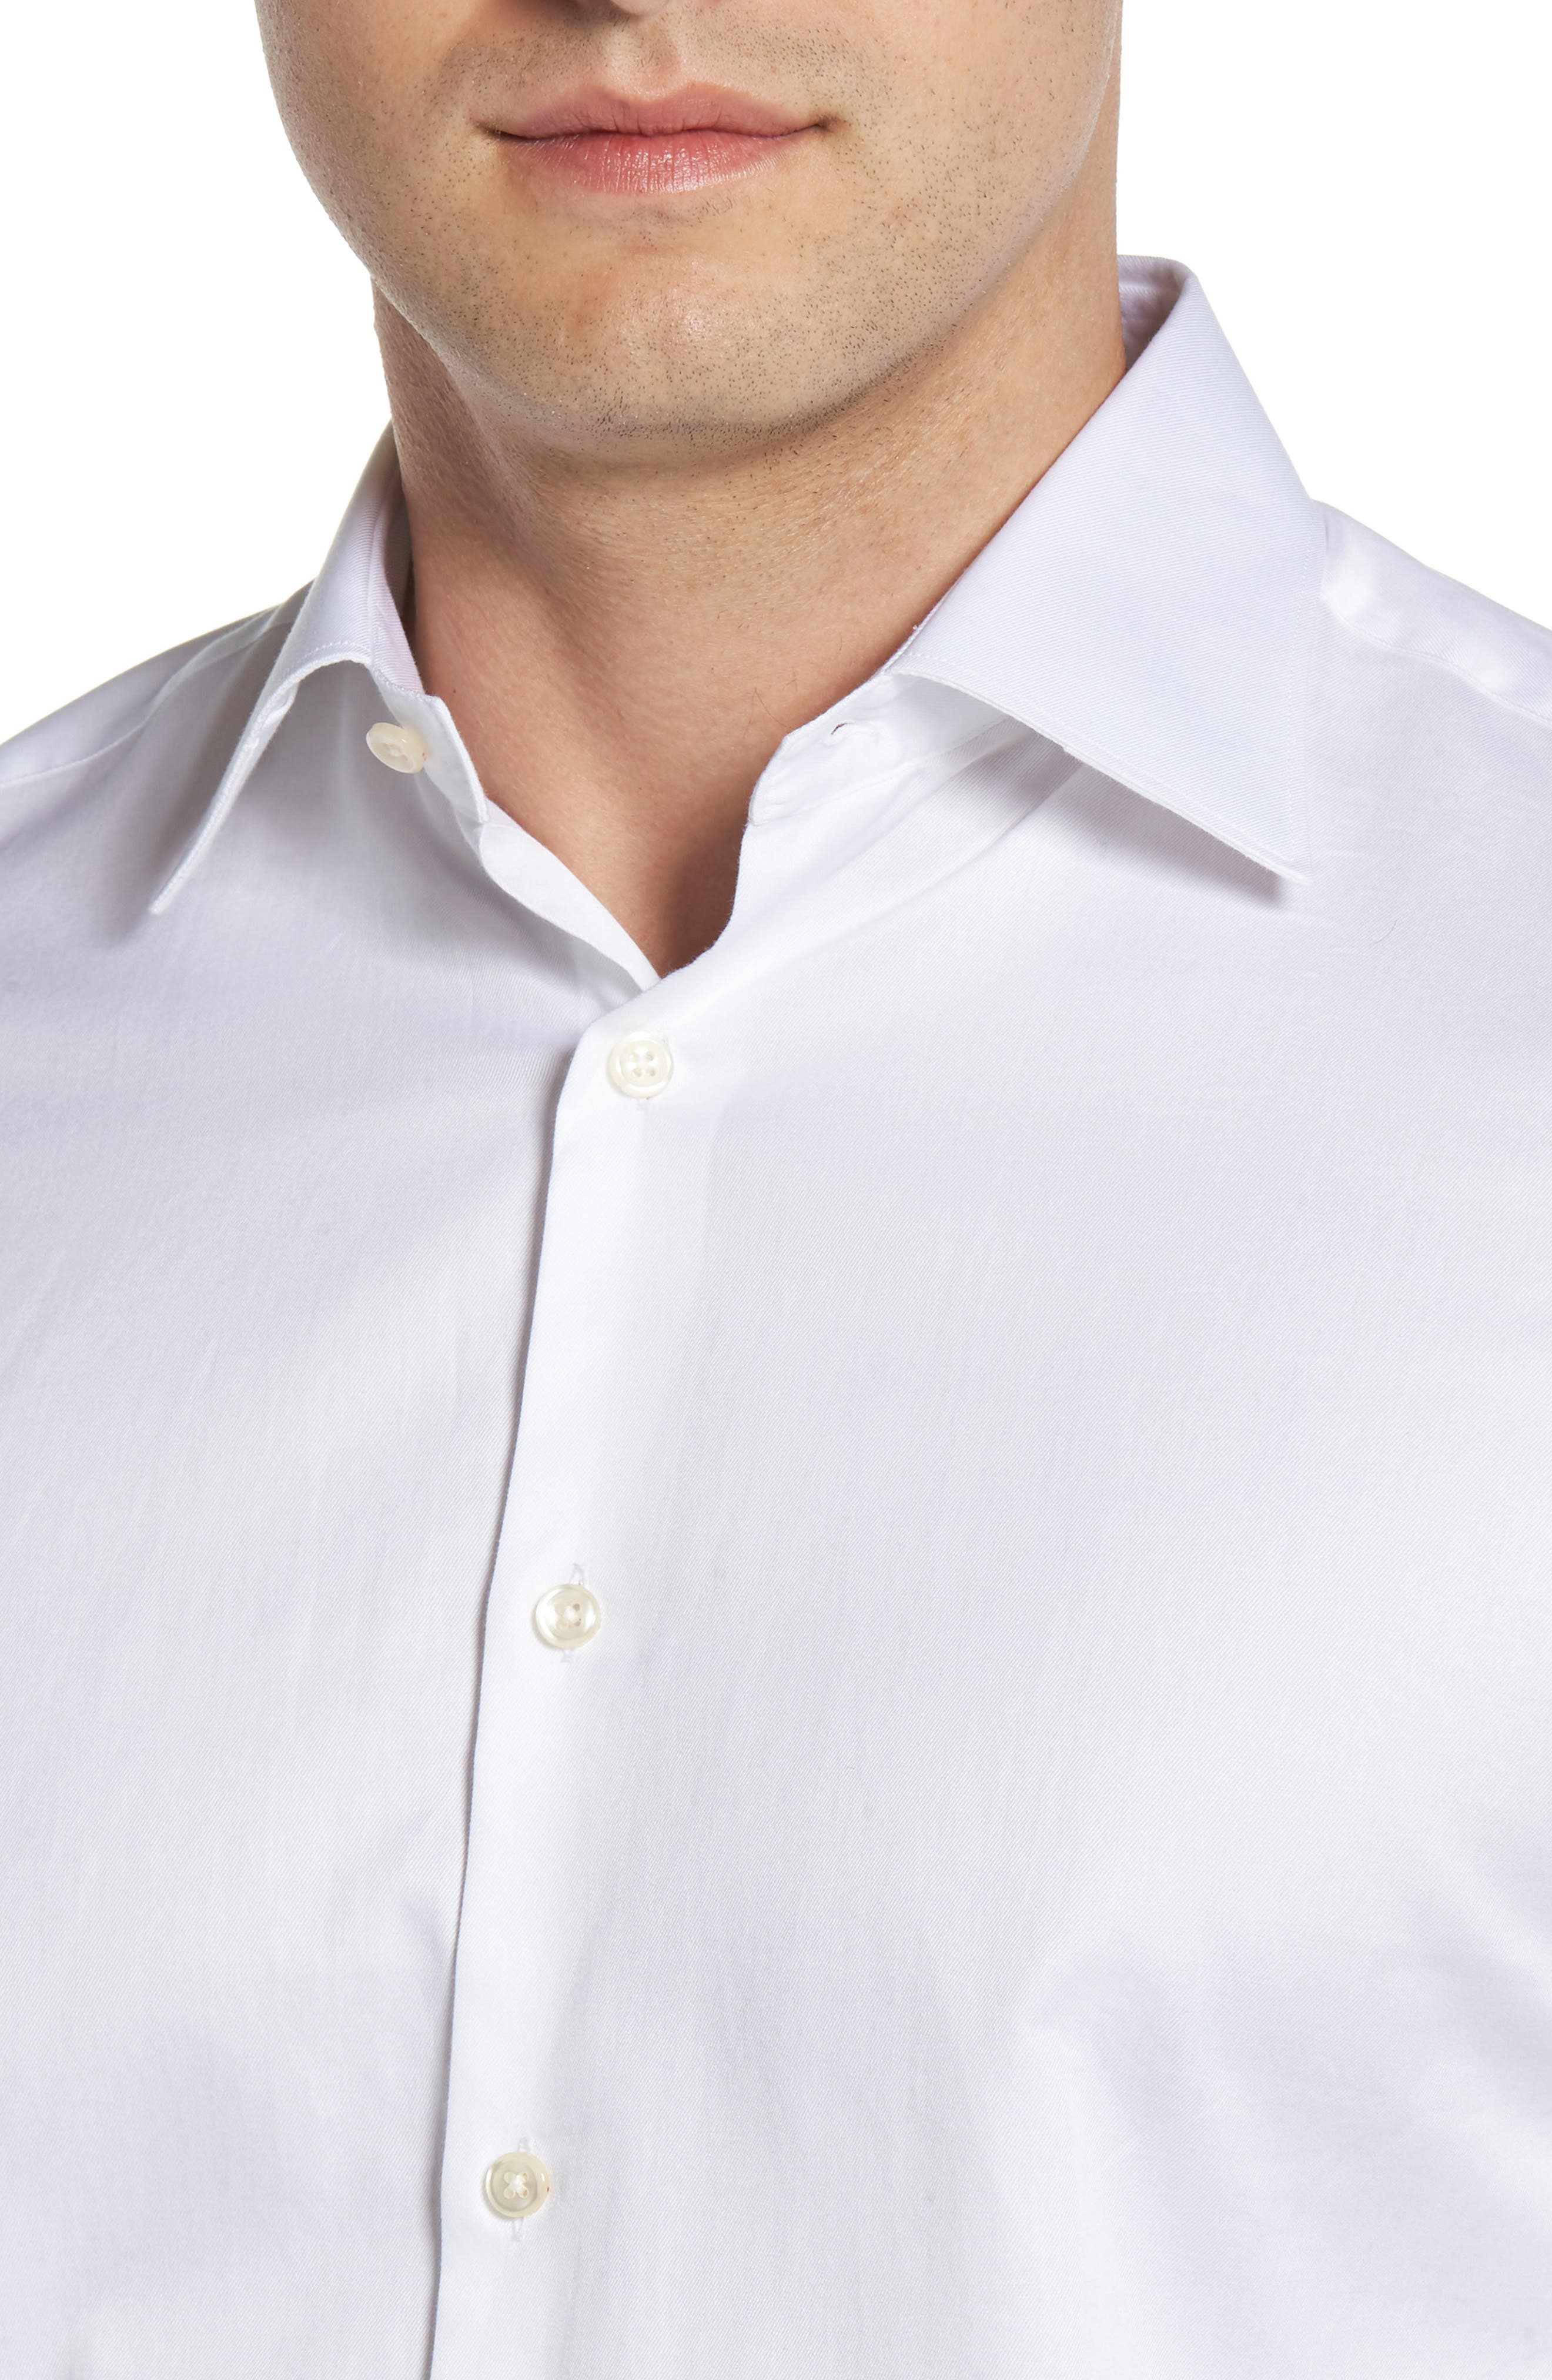 Regular Fit Solid Dress Shirt,                             Alternate thumbnail 2, color,                             100